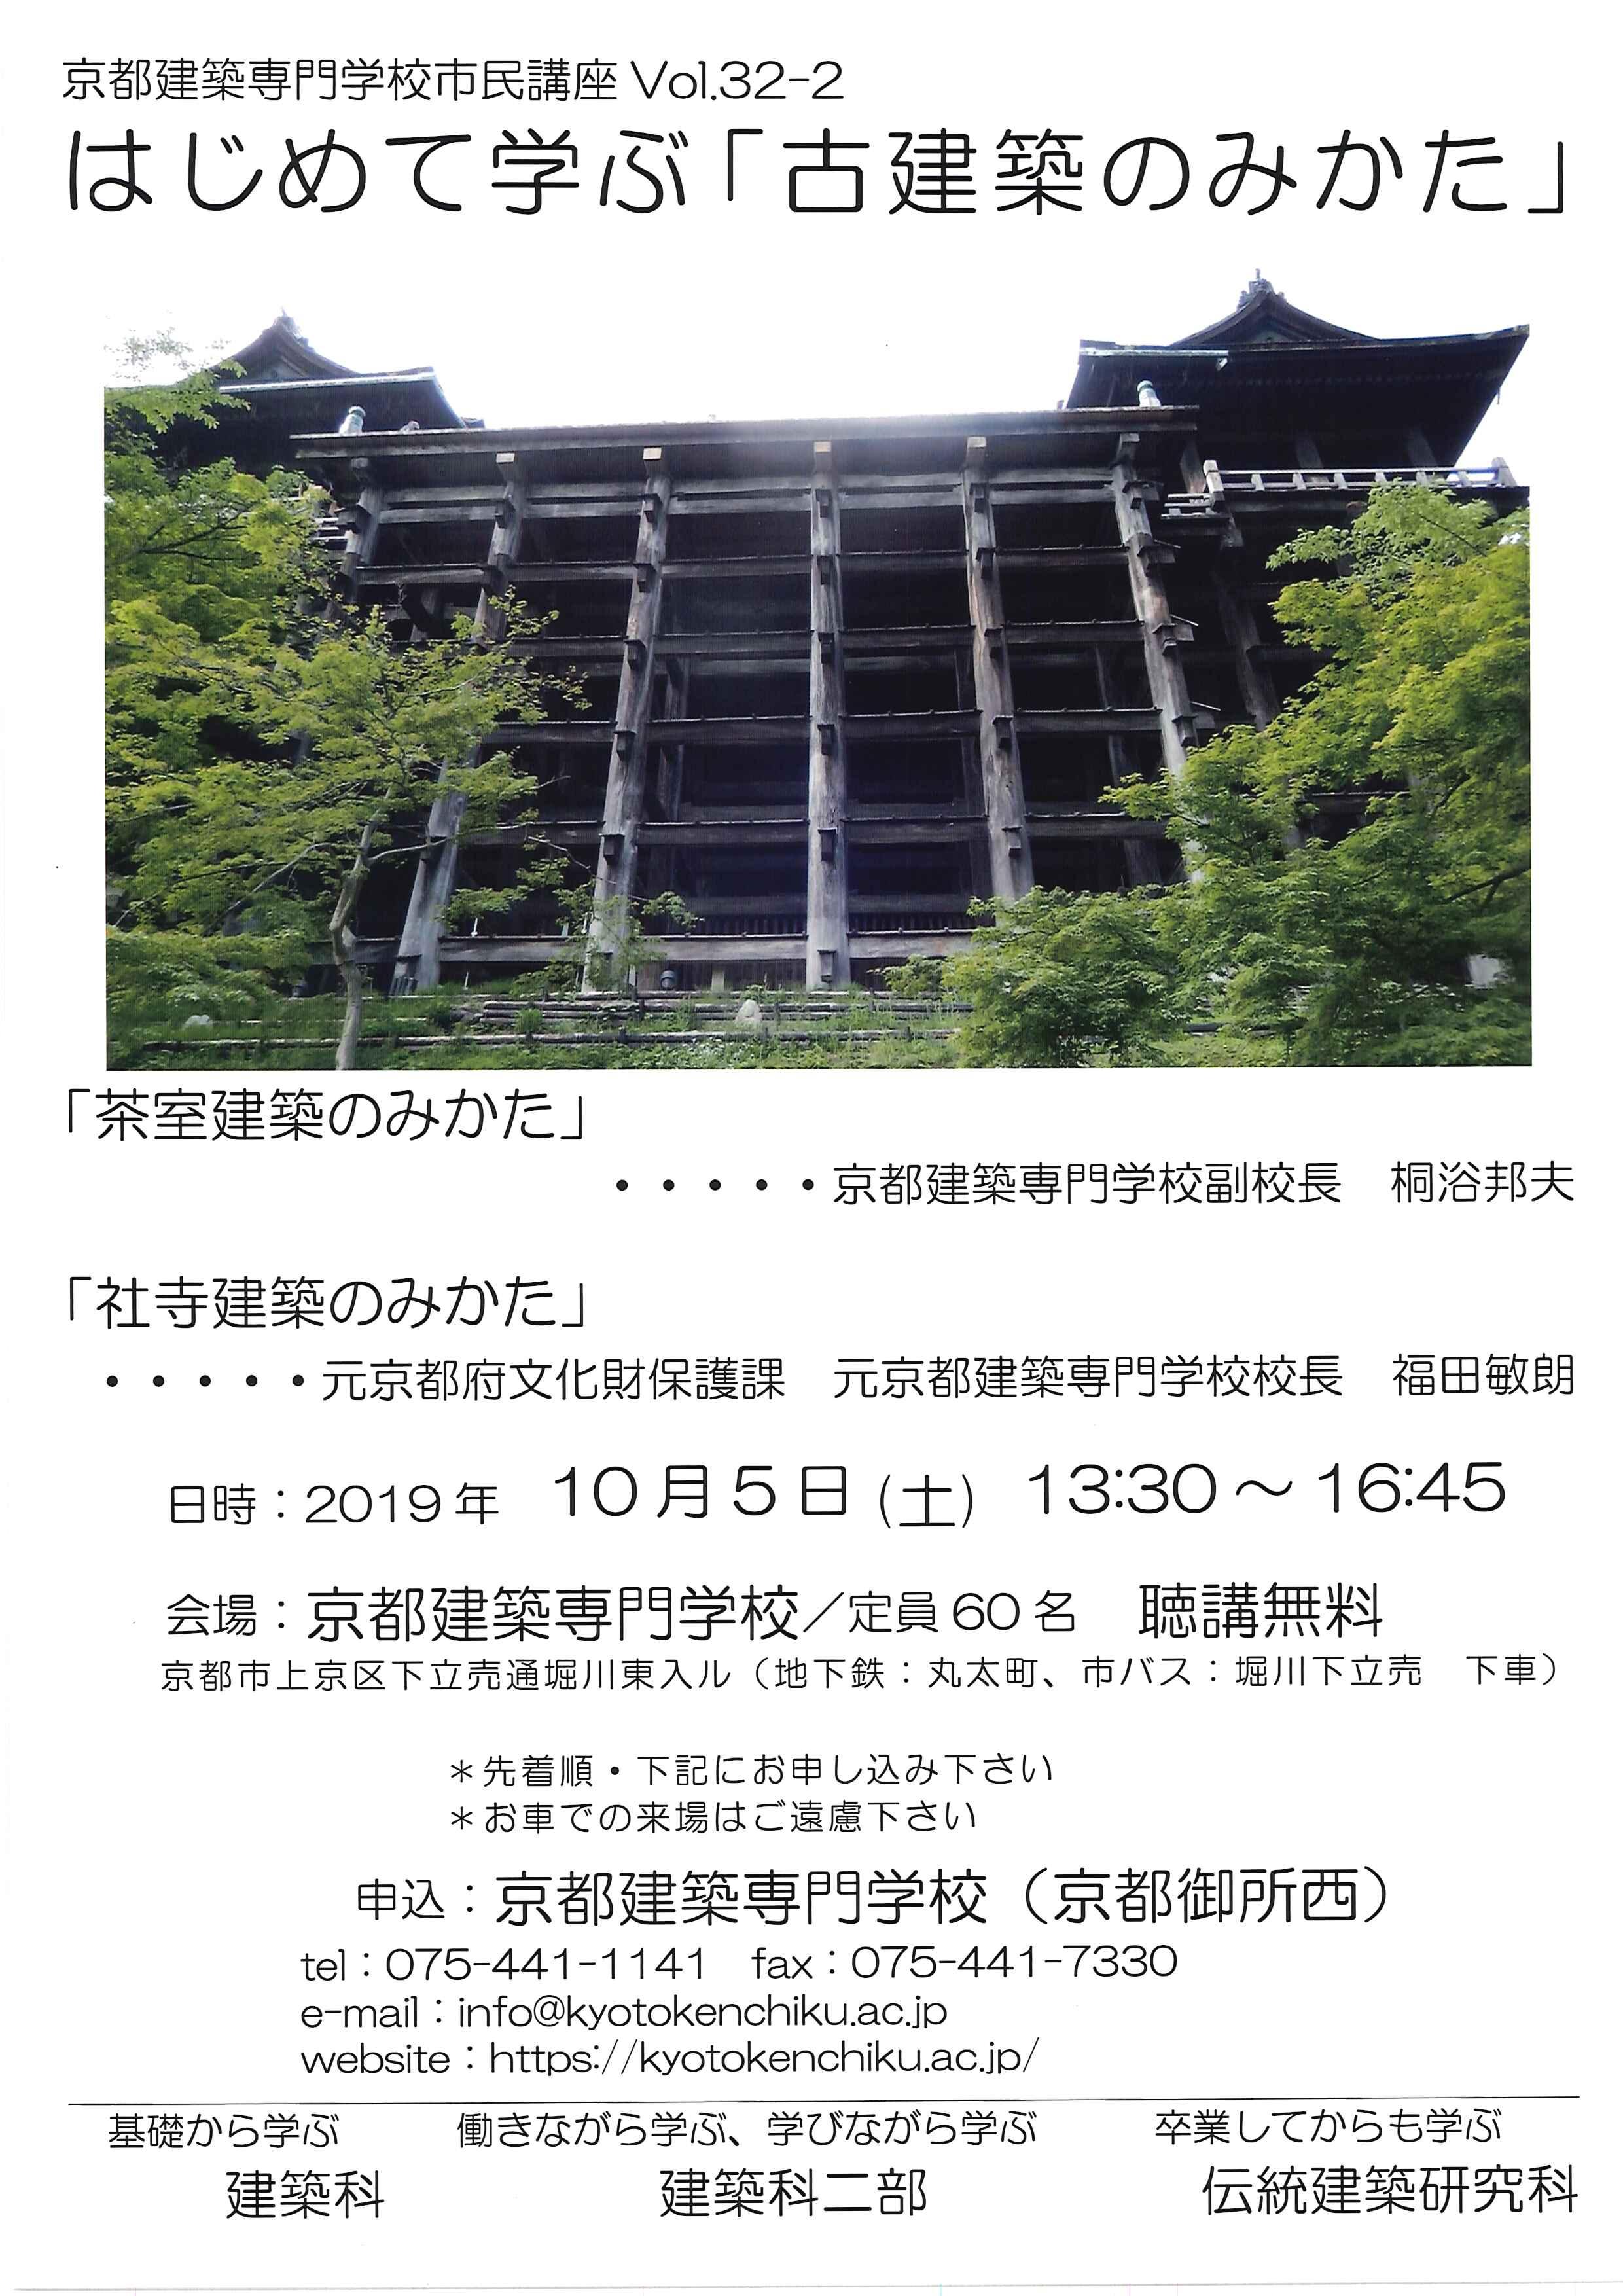 https://kyotokenchiku.ac.jp/wp-content/uploads/2019/08/2019-2-shimin.jpg